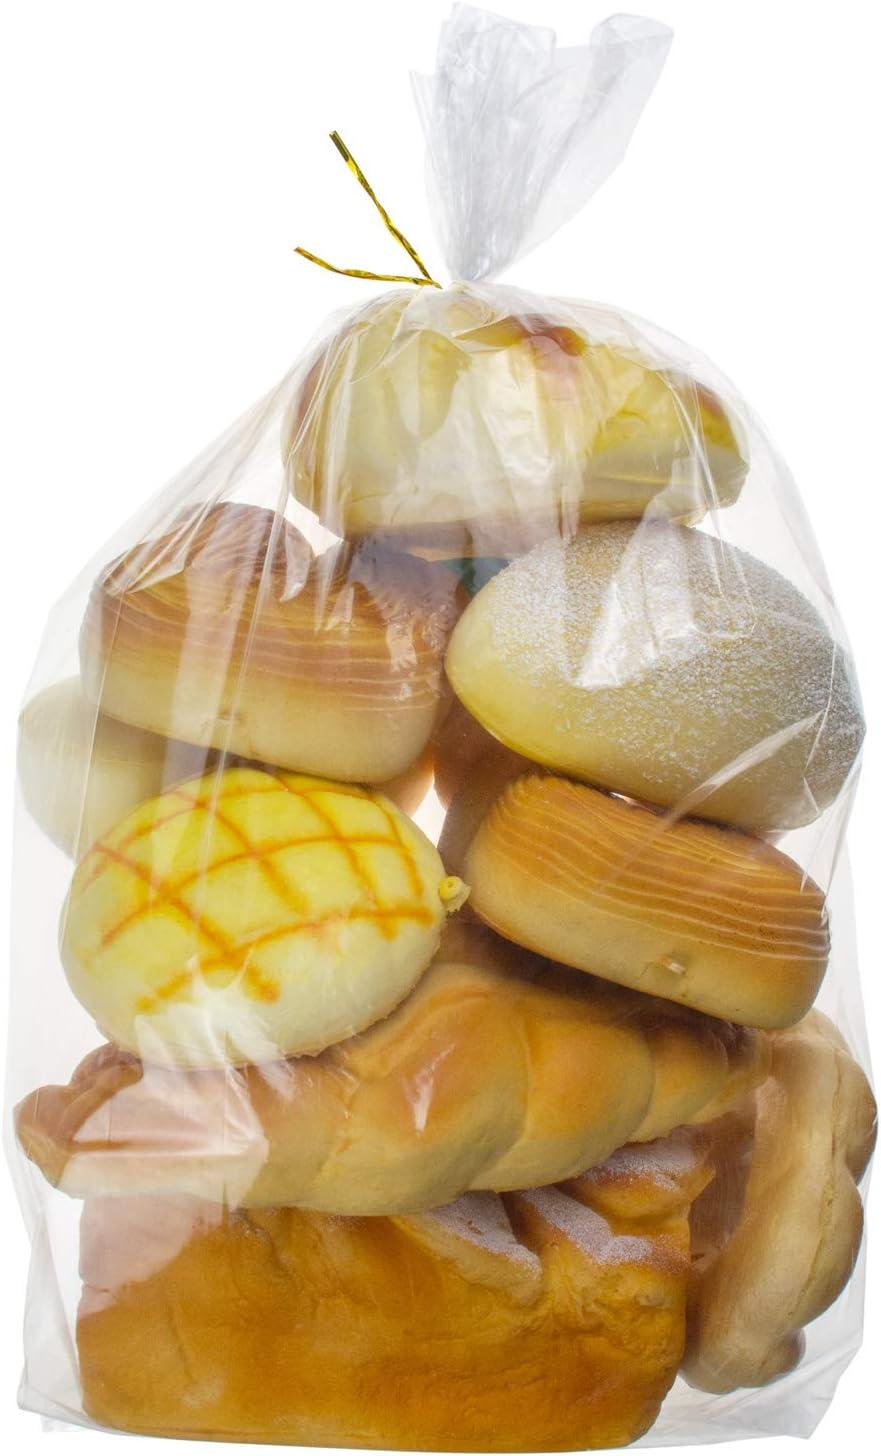 Lesibag 200 Piece Bread Loaf Bags - 8